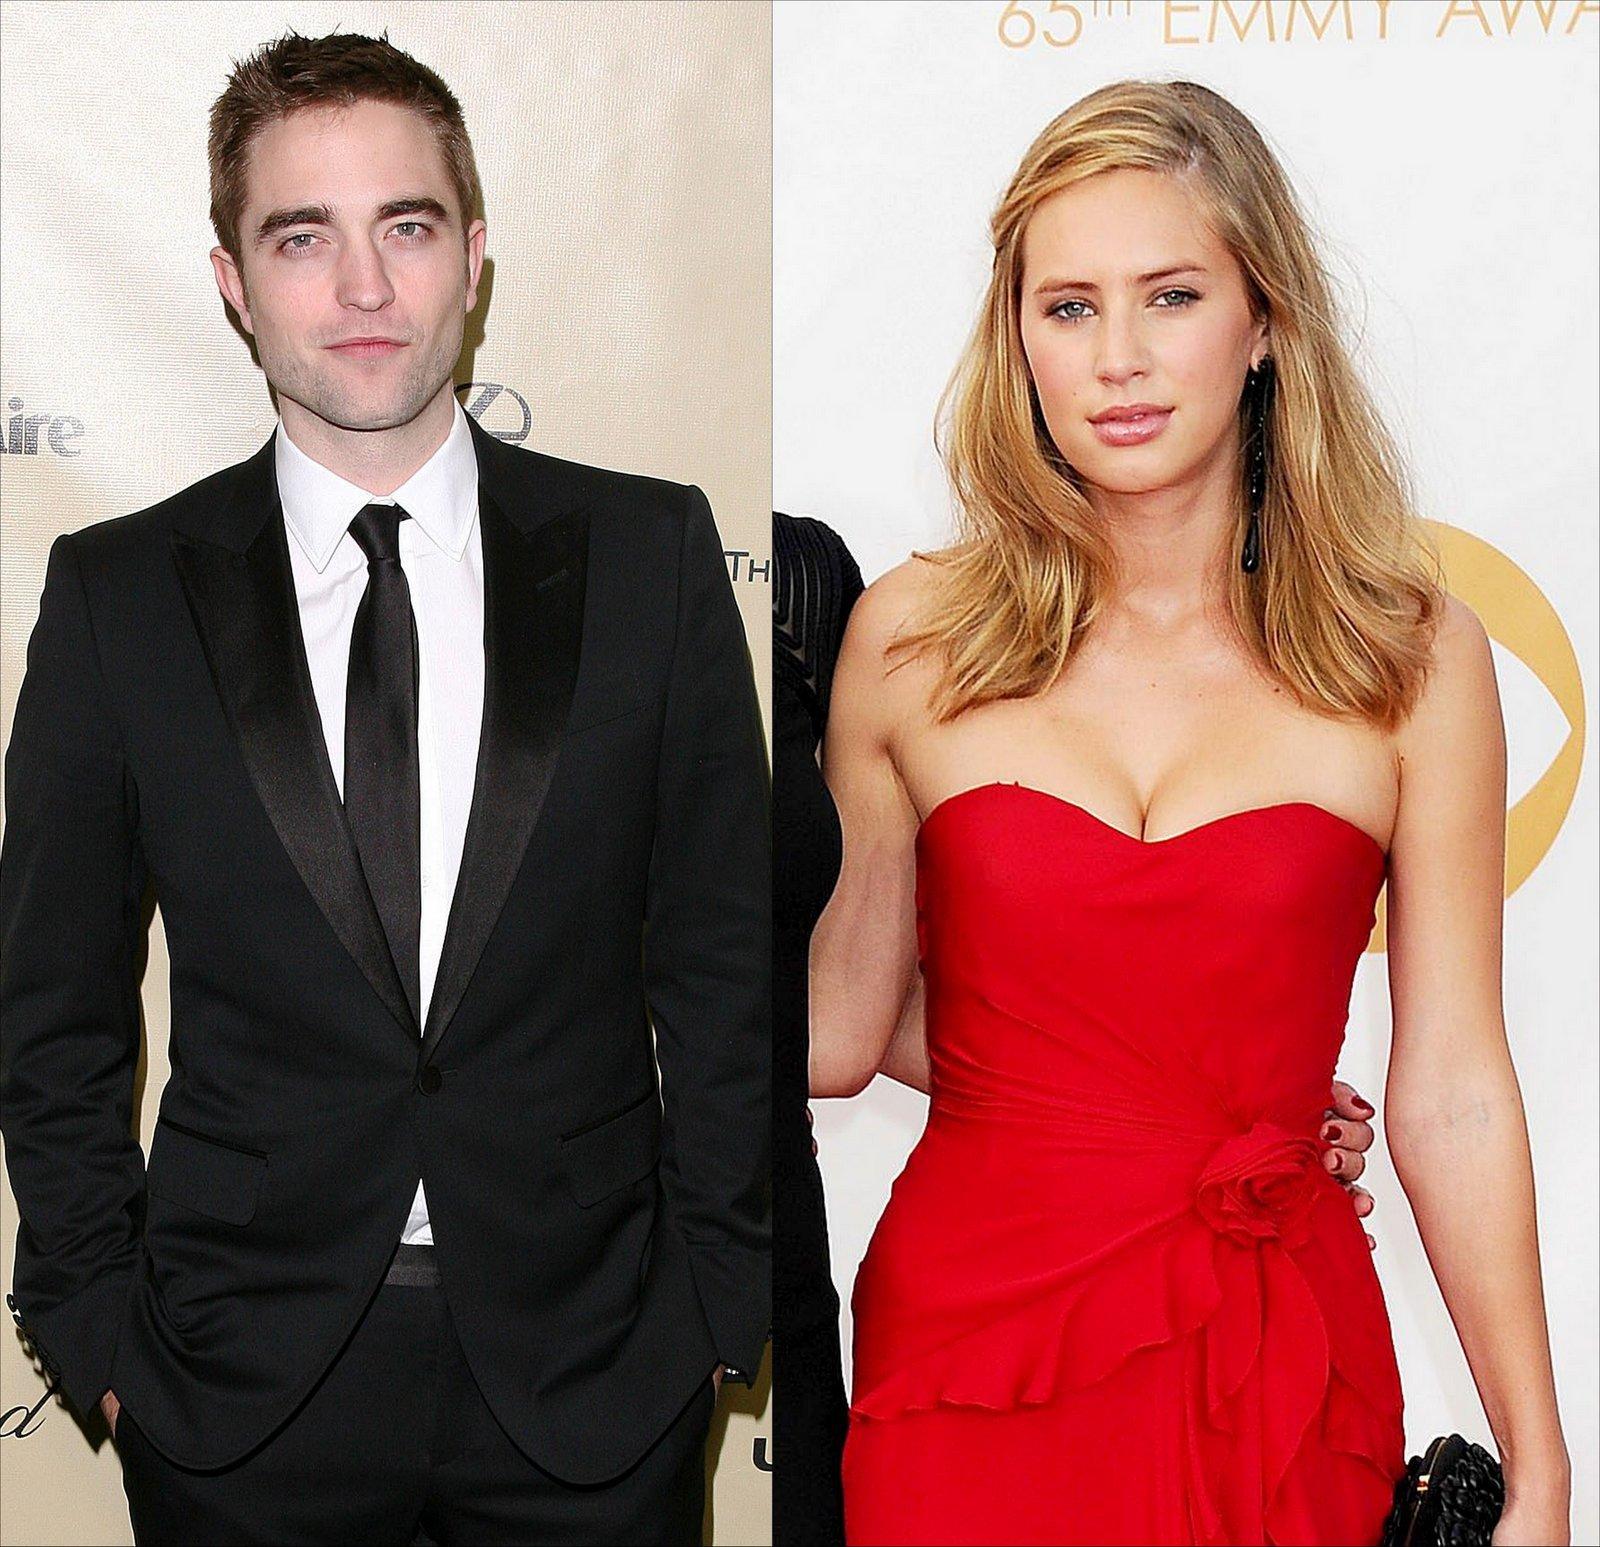 Robert Pattinson Dylan Penn